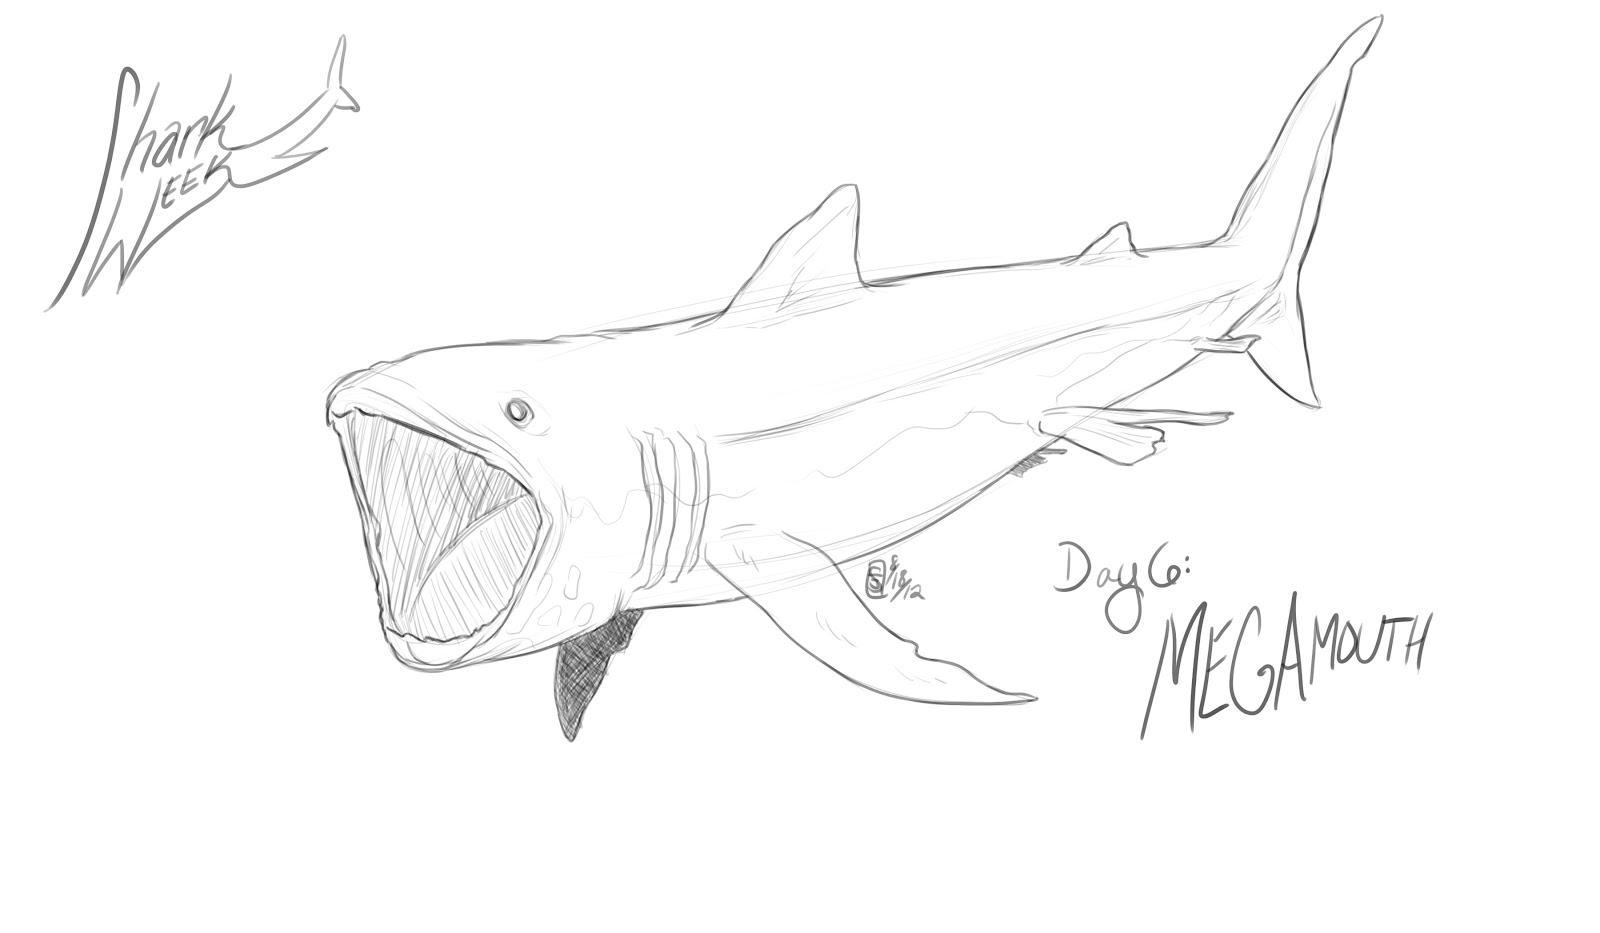 1600x933 Megamouth Shark Coloring Page 1080p